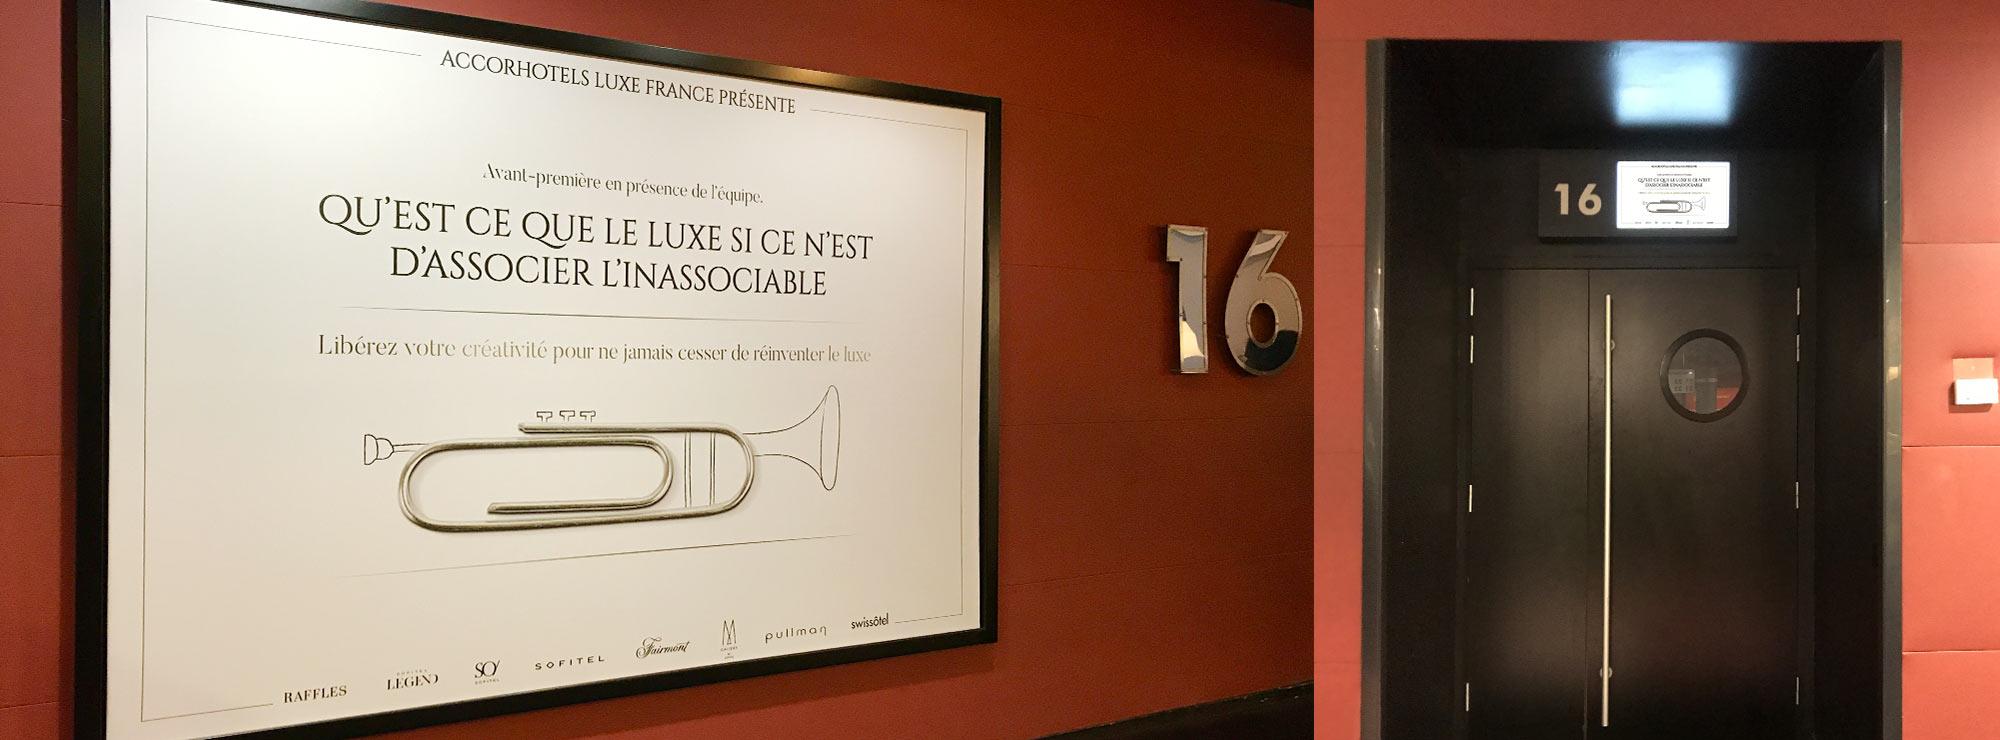 08.accorhotels_convention_ugc_bercy_entree_salle_cinema